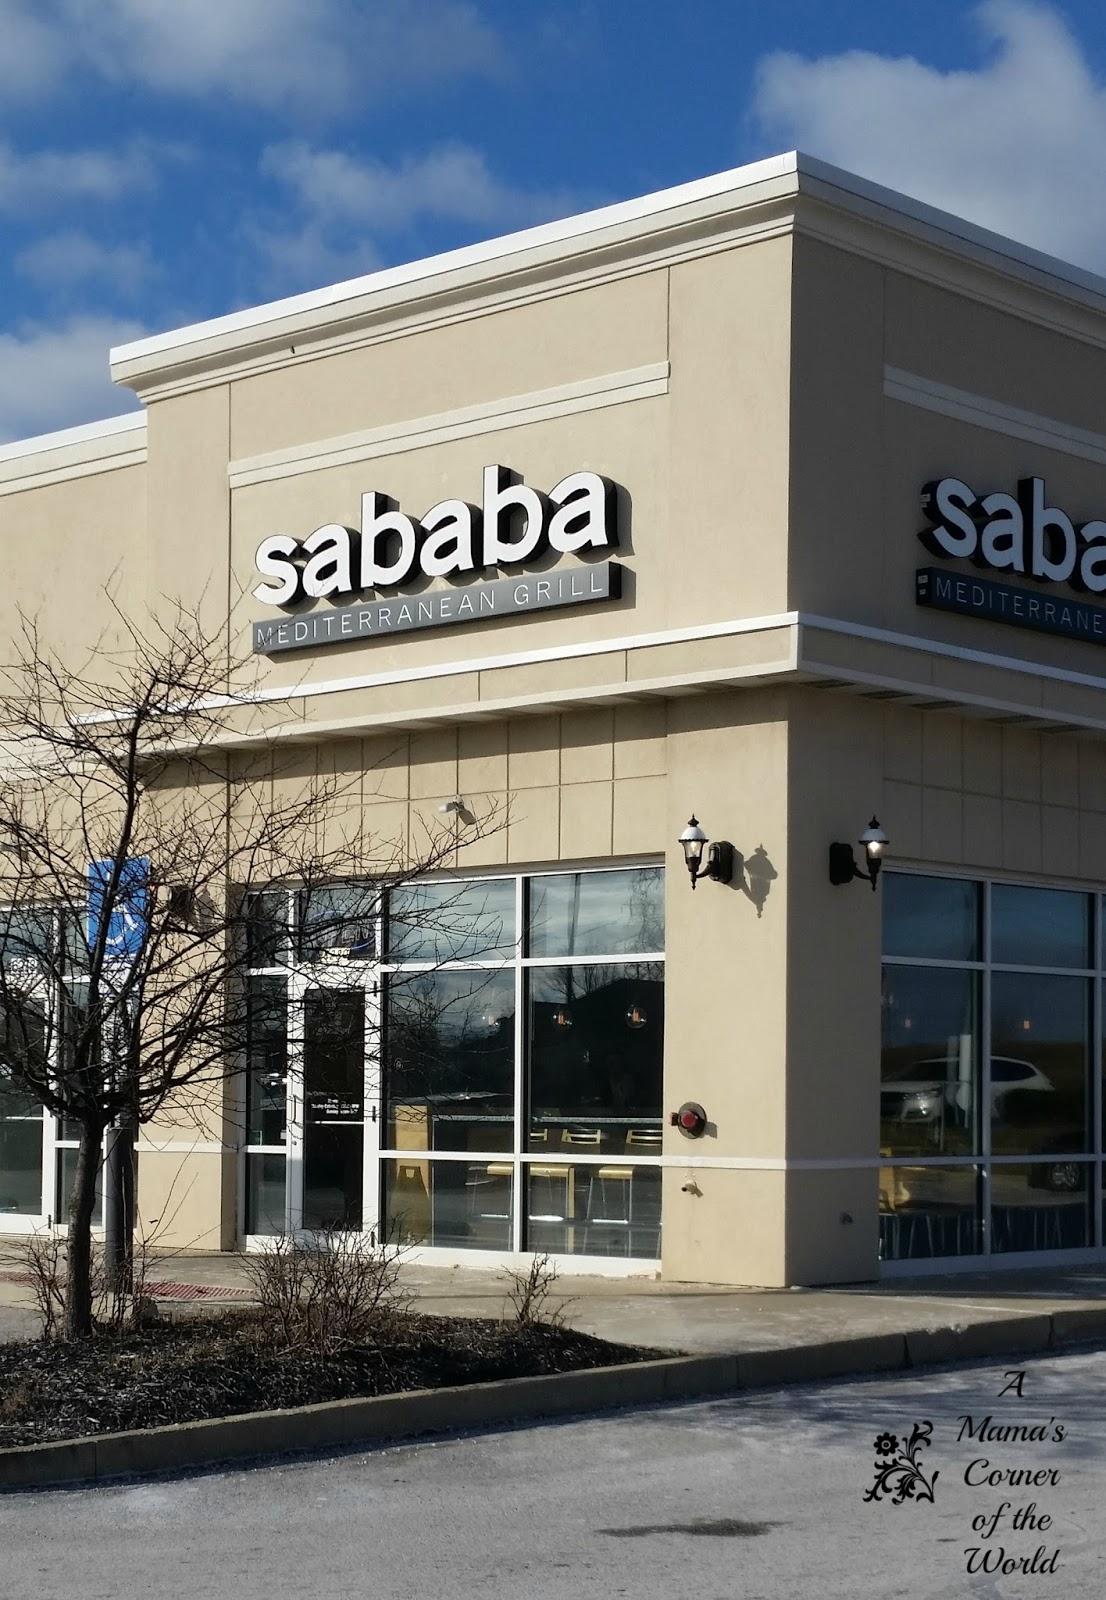 Sababa Mediterranean Grill Columbus, Ohio Restaurant Review